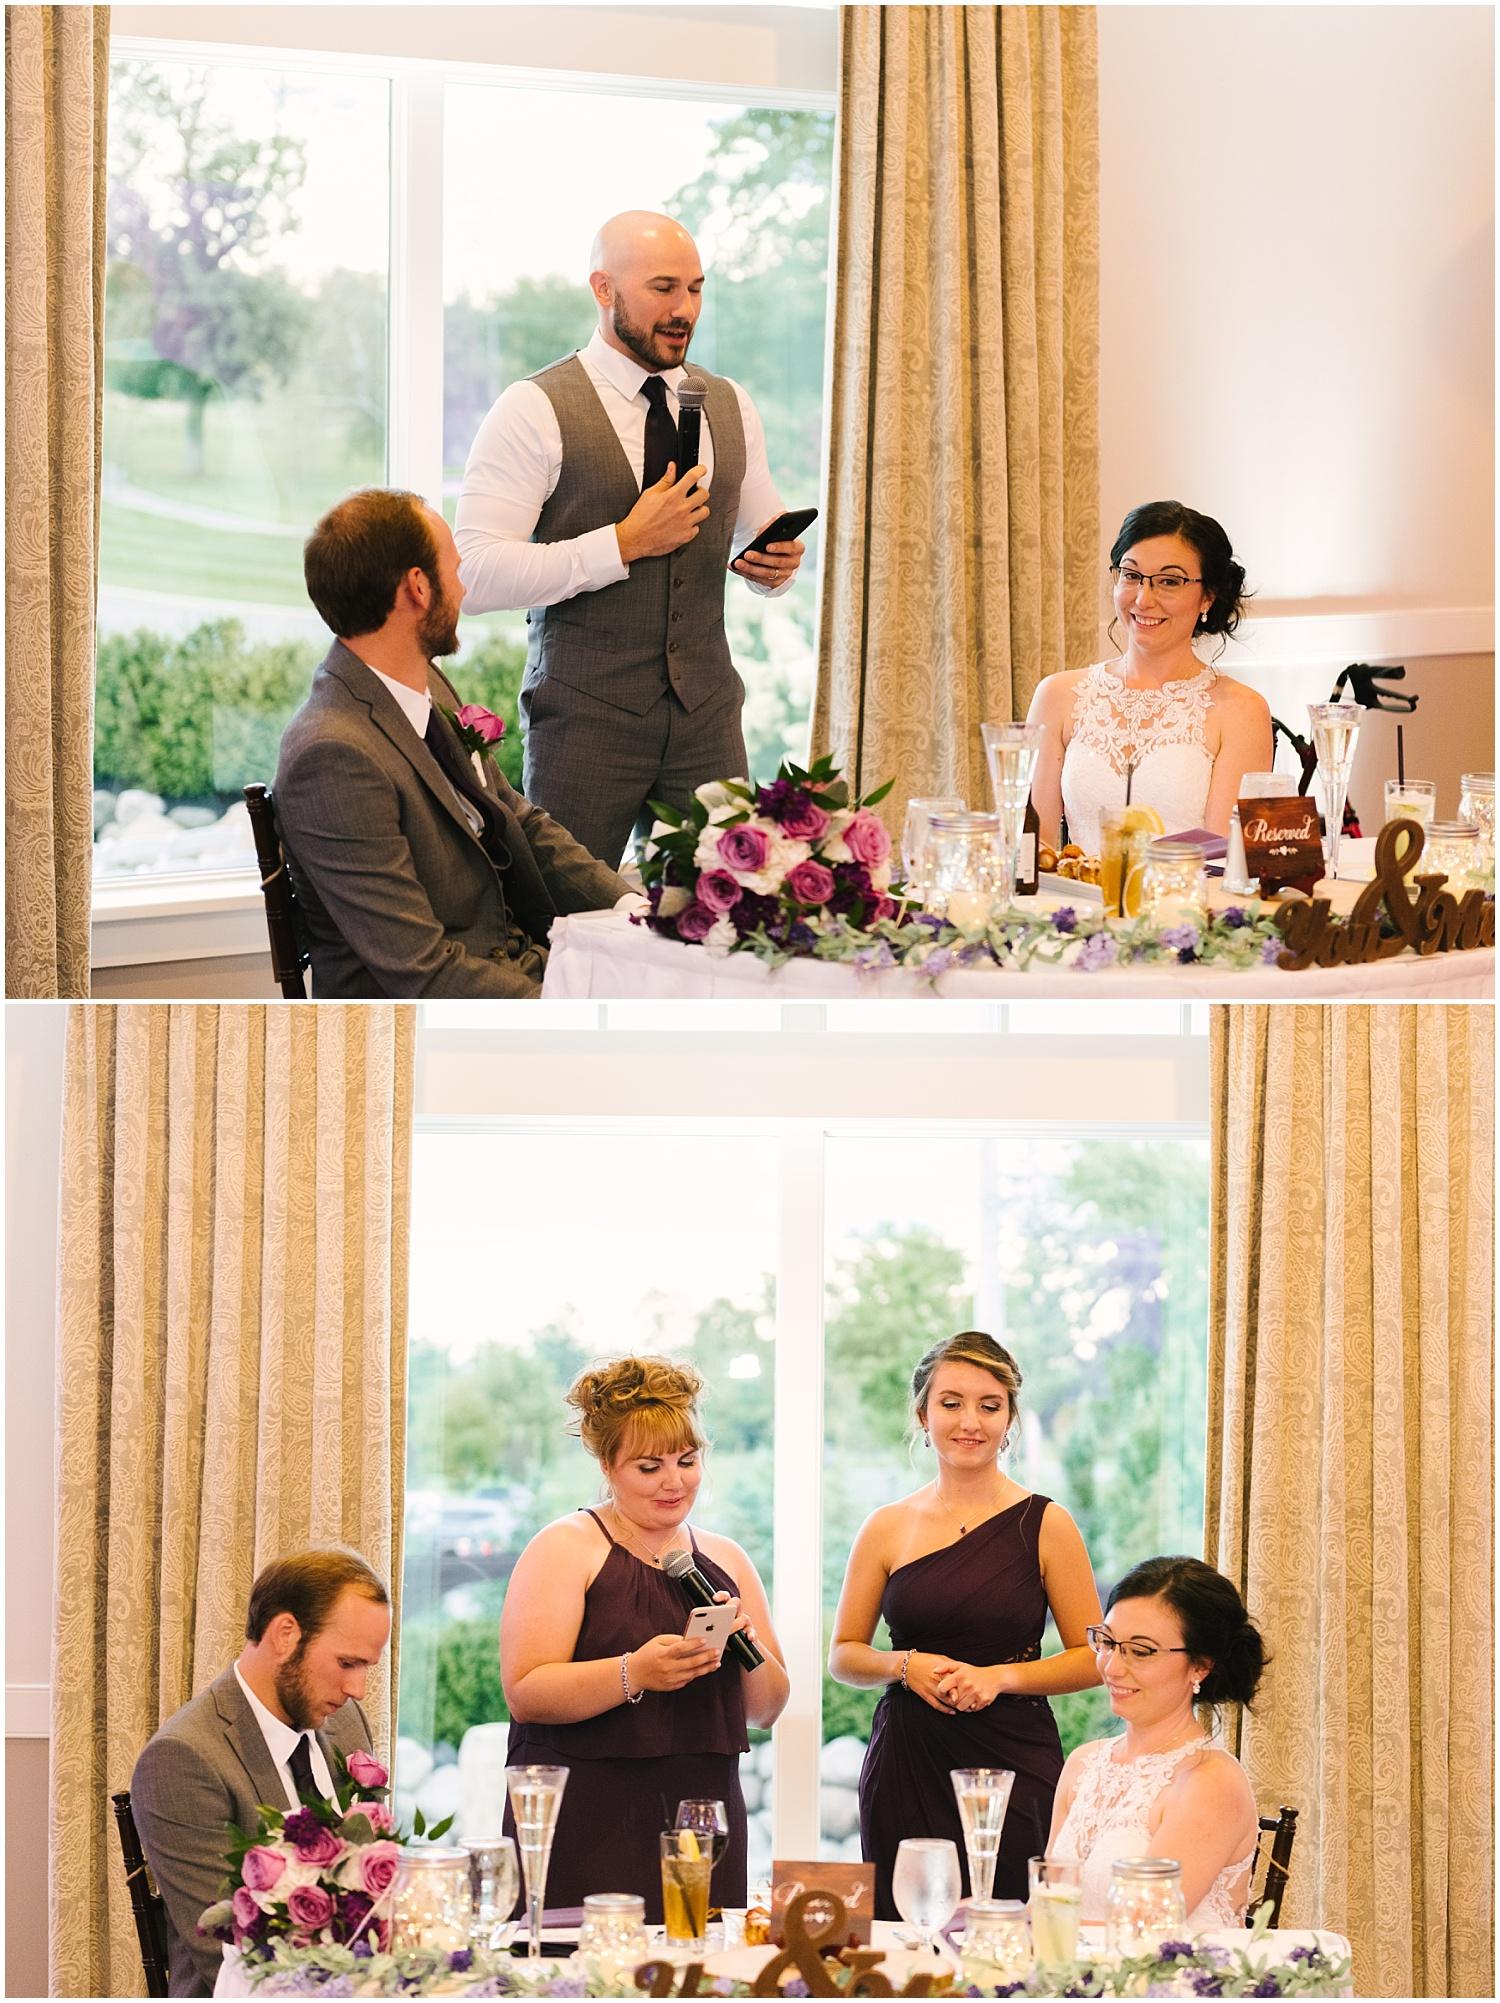 deerfield+country+club+wedding+rochester+NY+photographer (109).jpg